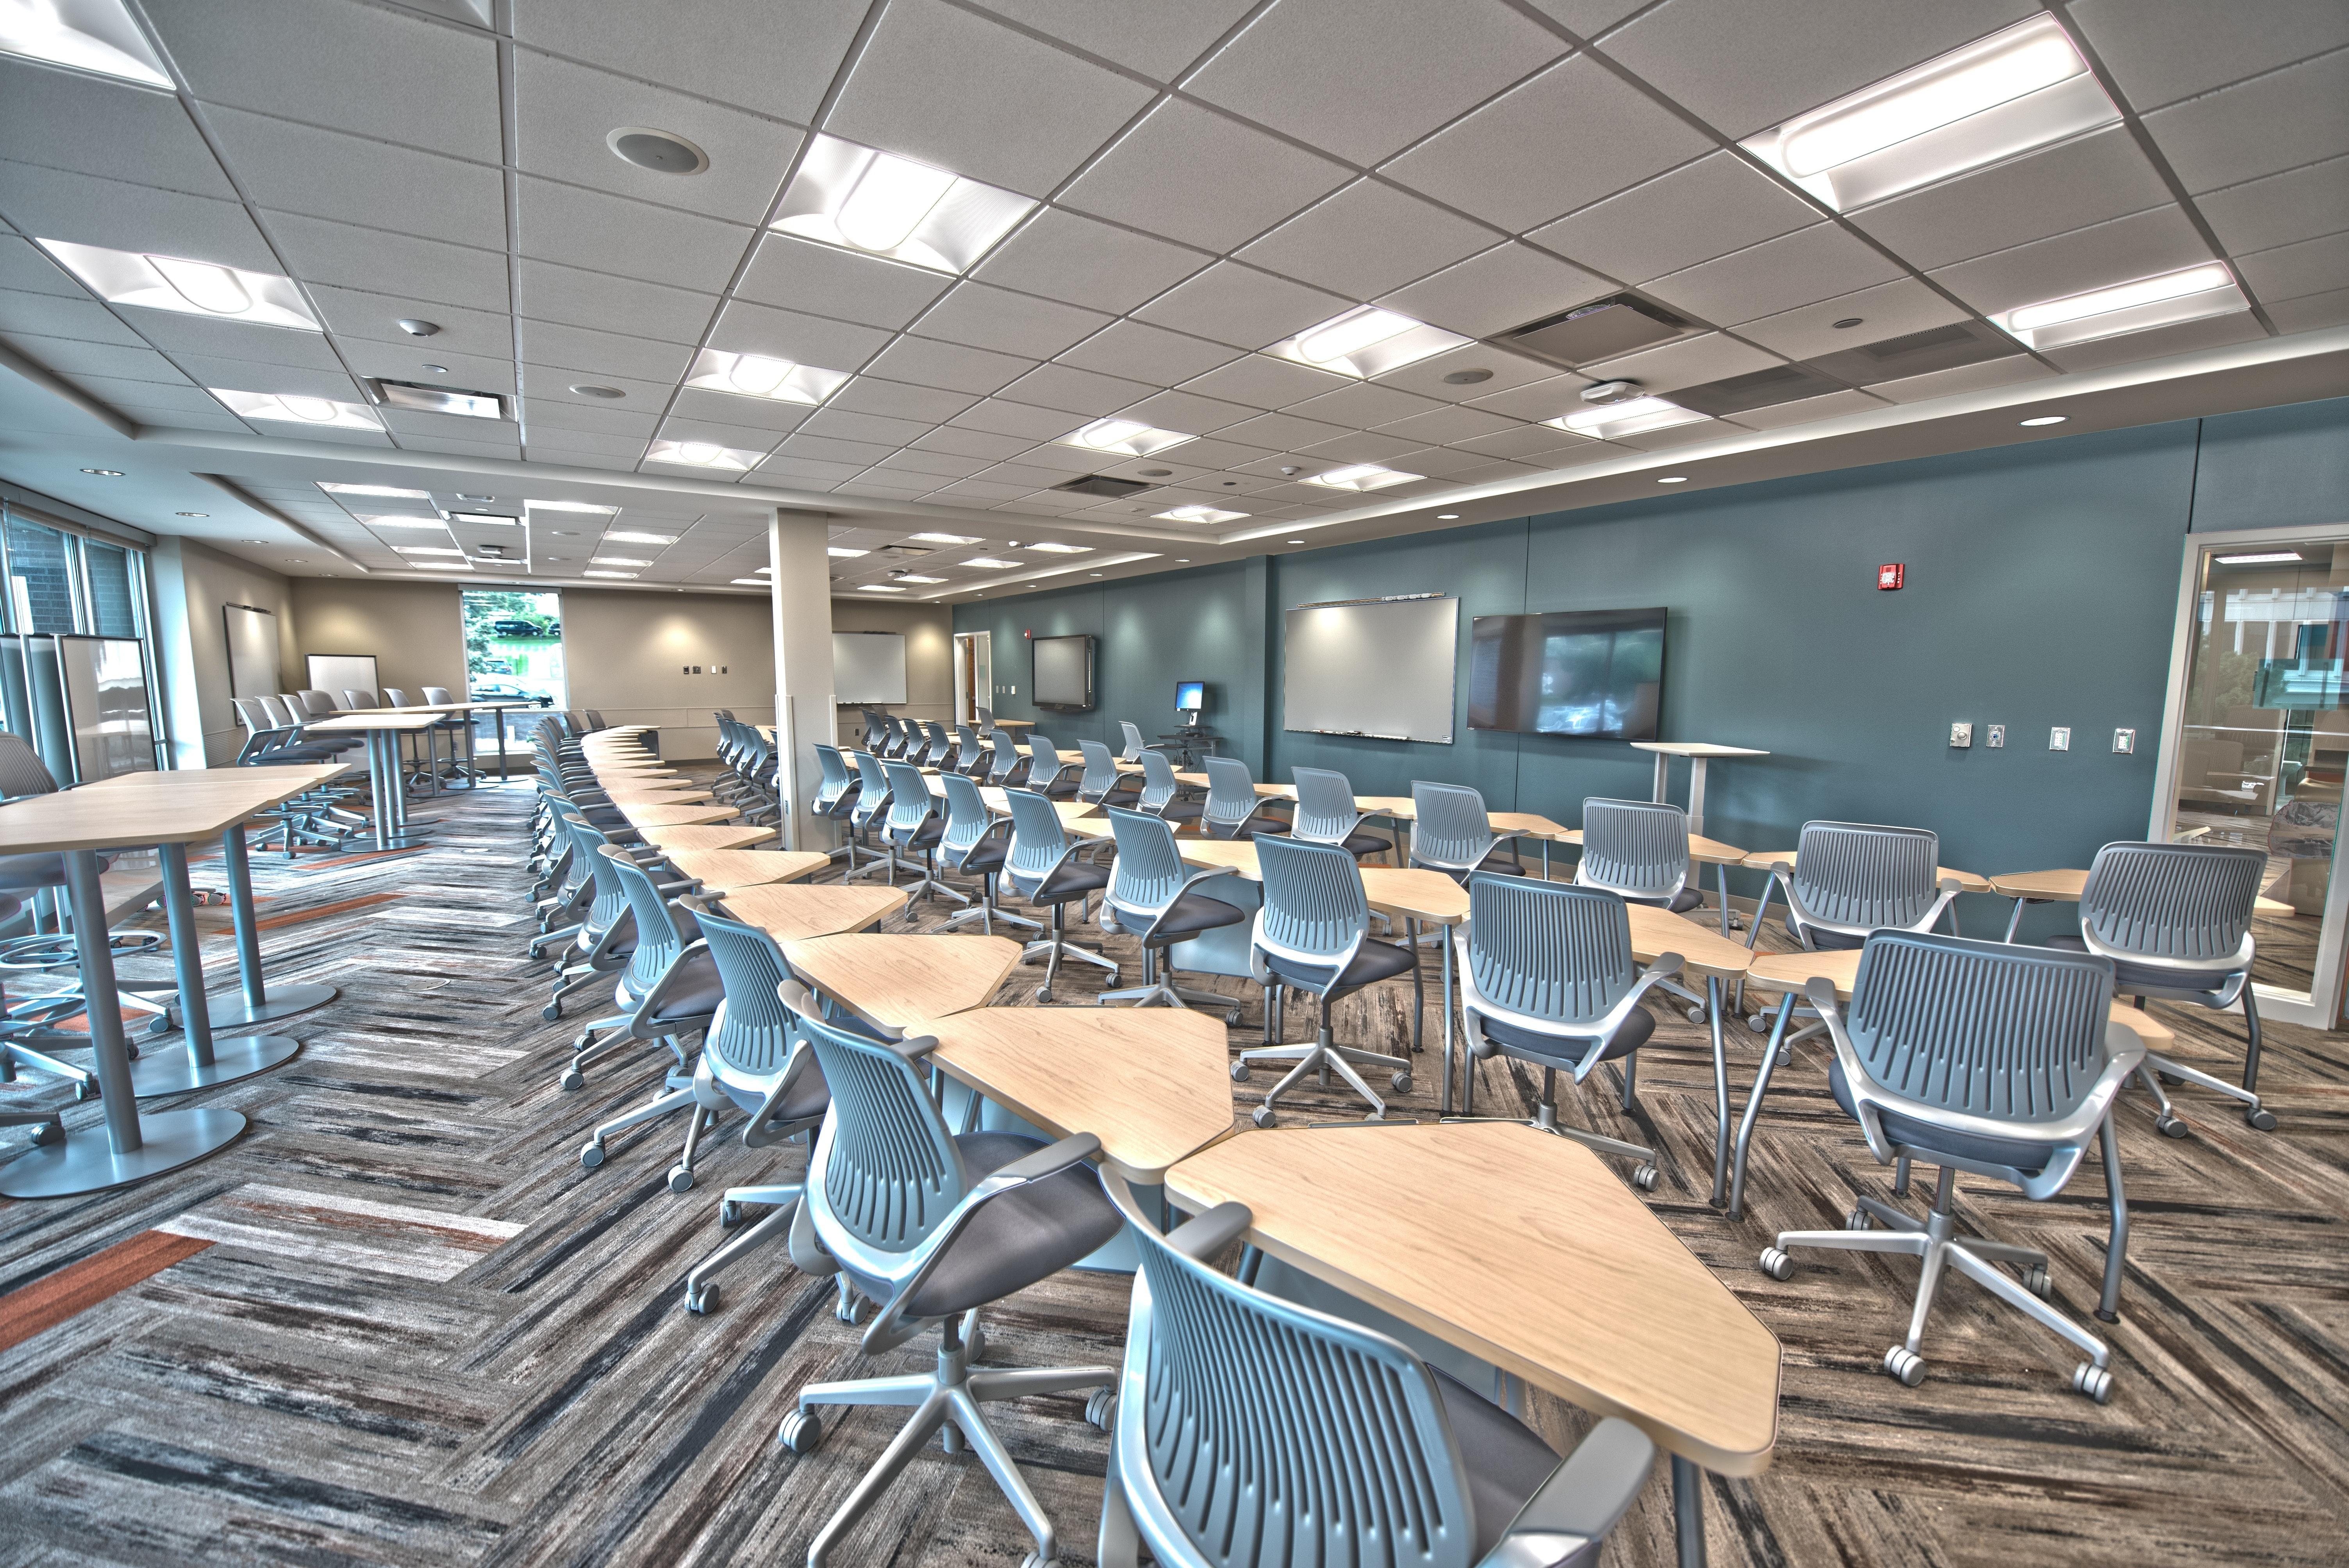 Modern Classroom Management ~ Amazing desks photos · pexels free stock